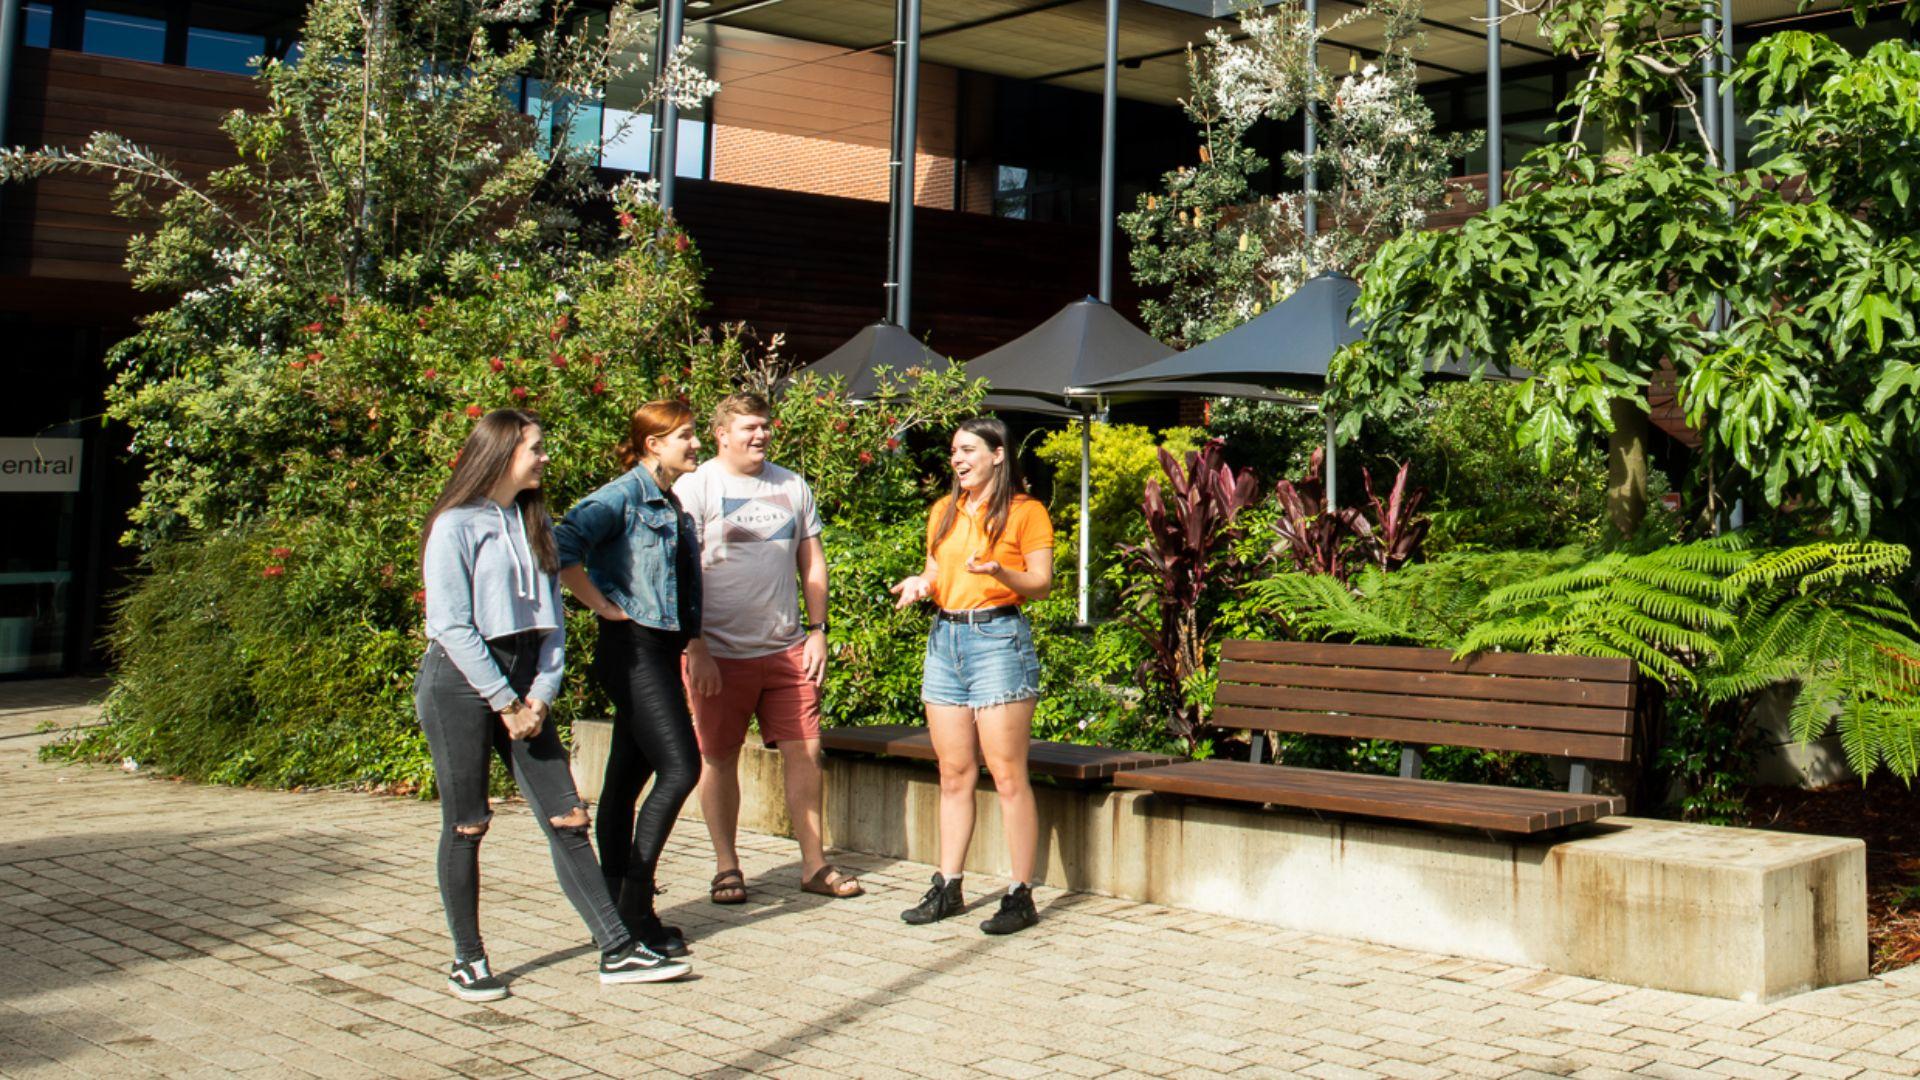 Almost 1,500 students gain an advantage through Charles Sturt